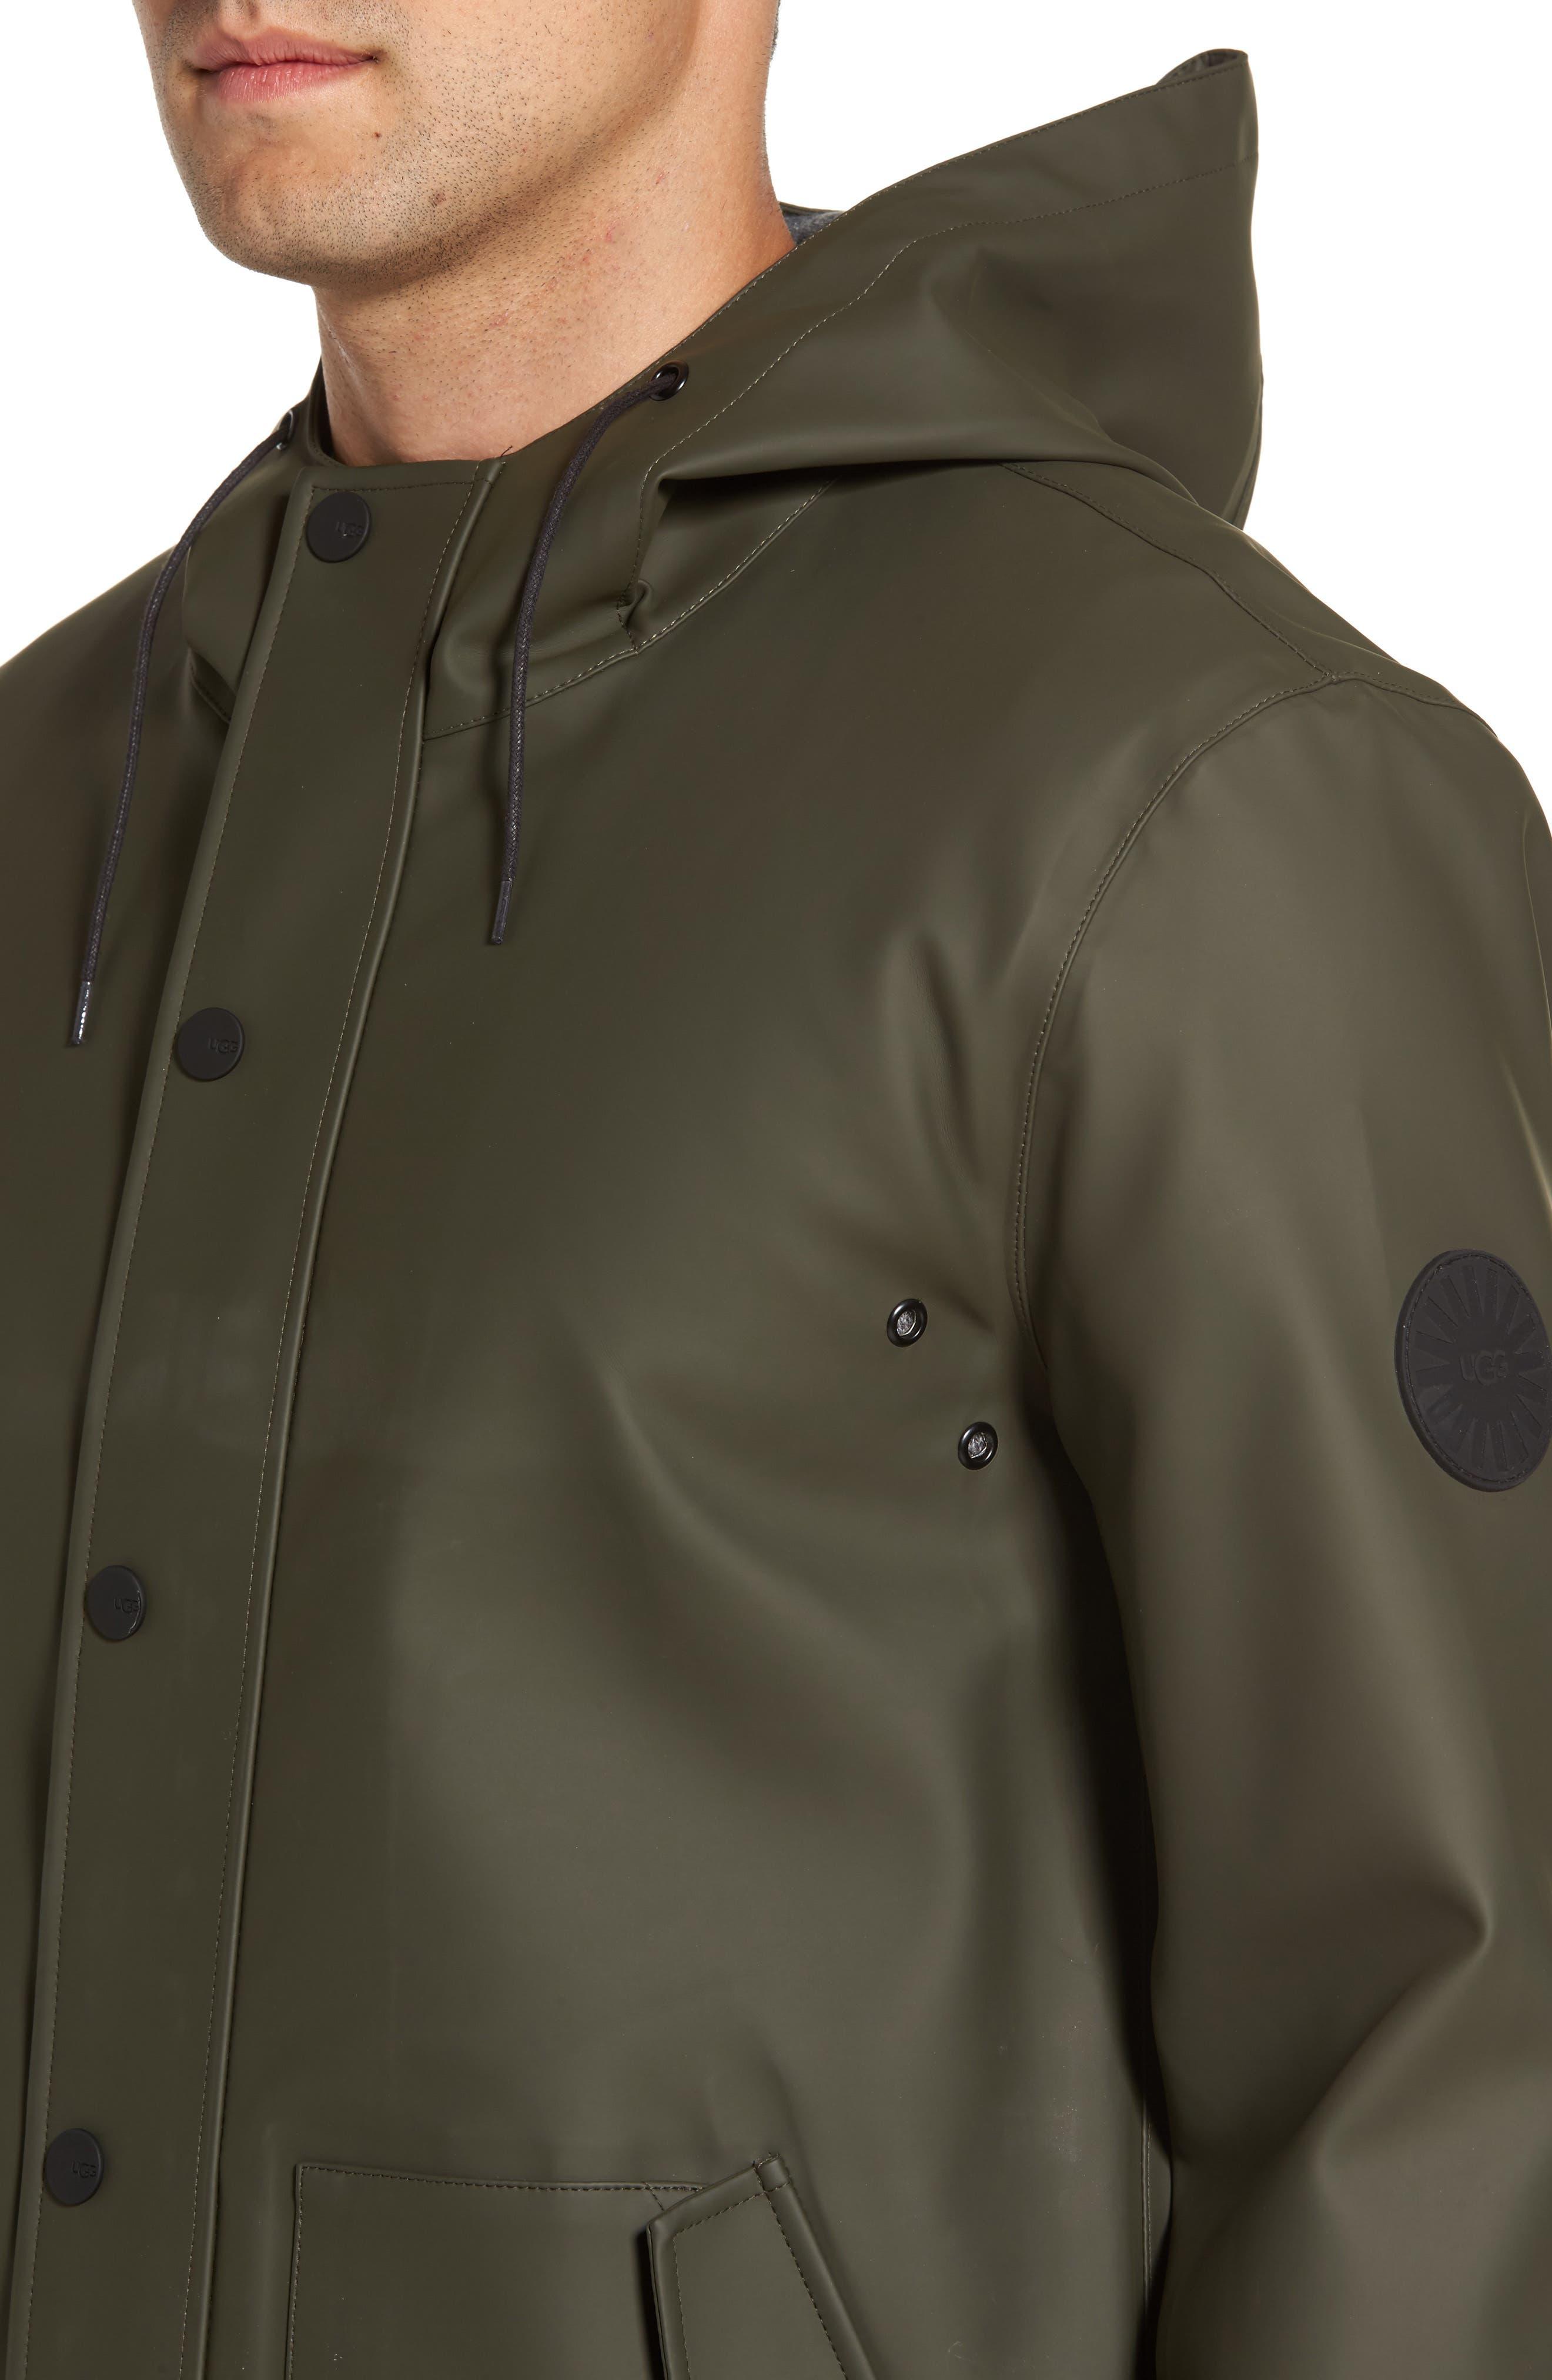 Hooded Raincoat,                             Alternate thumbnail 4, color,                             Olive